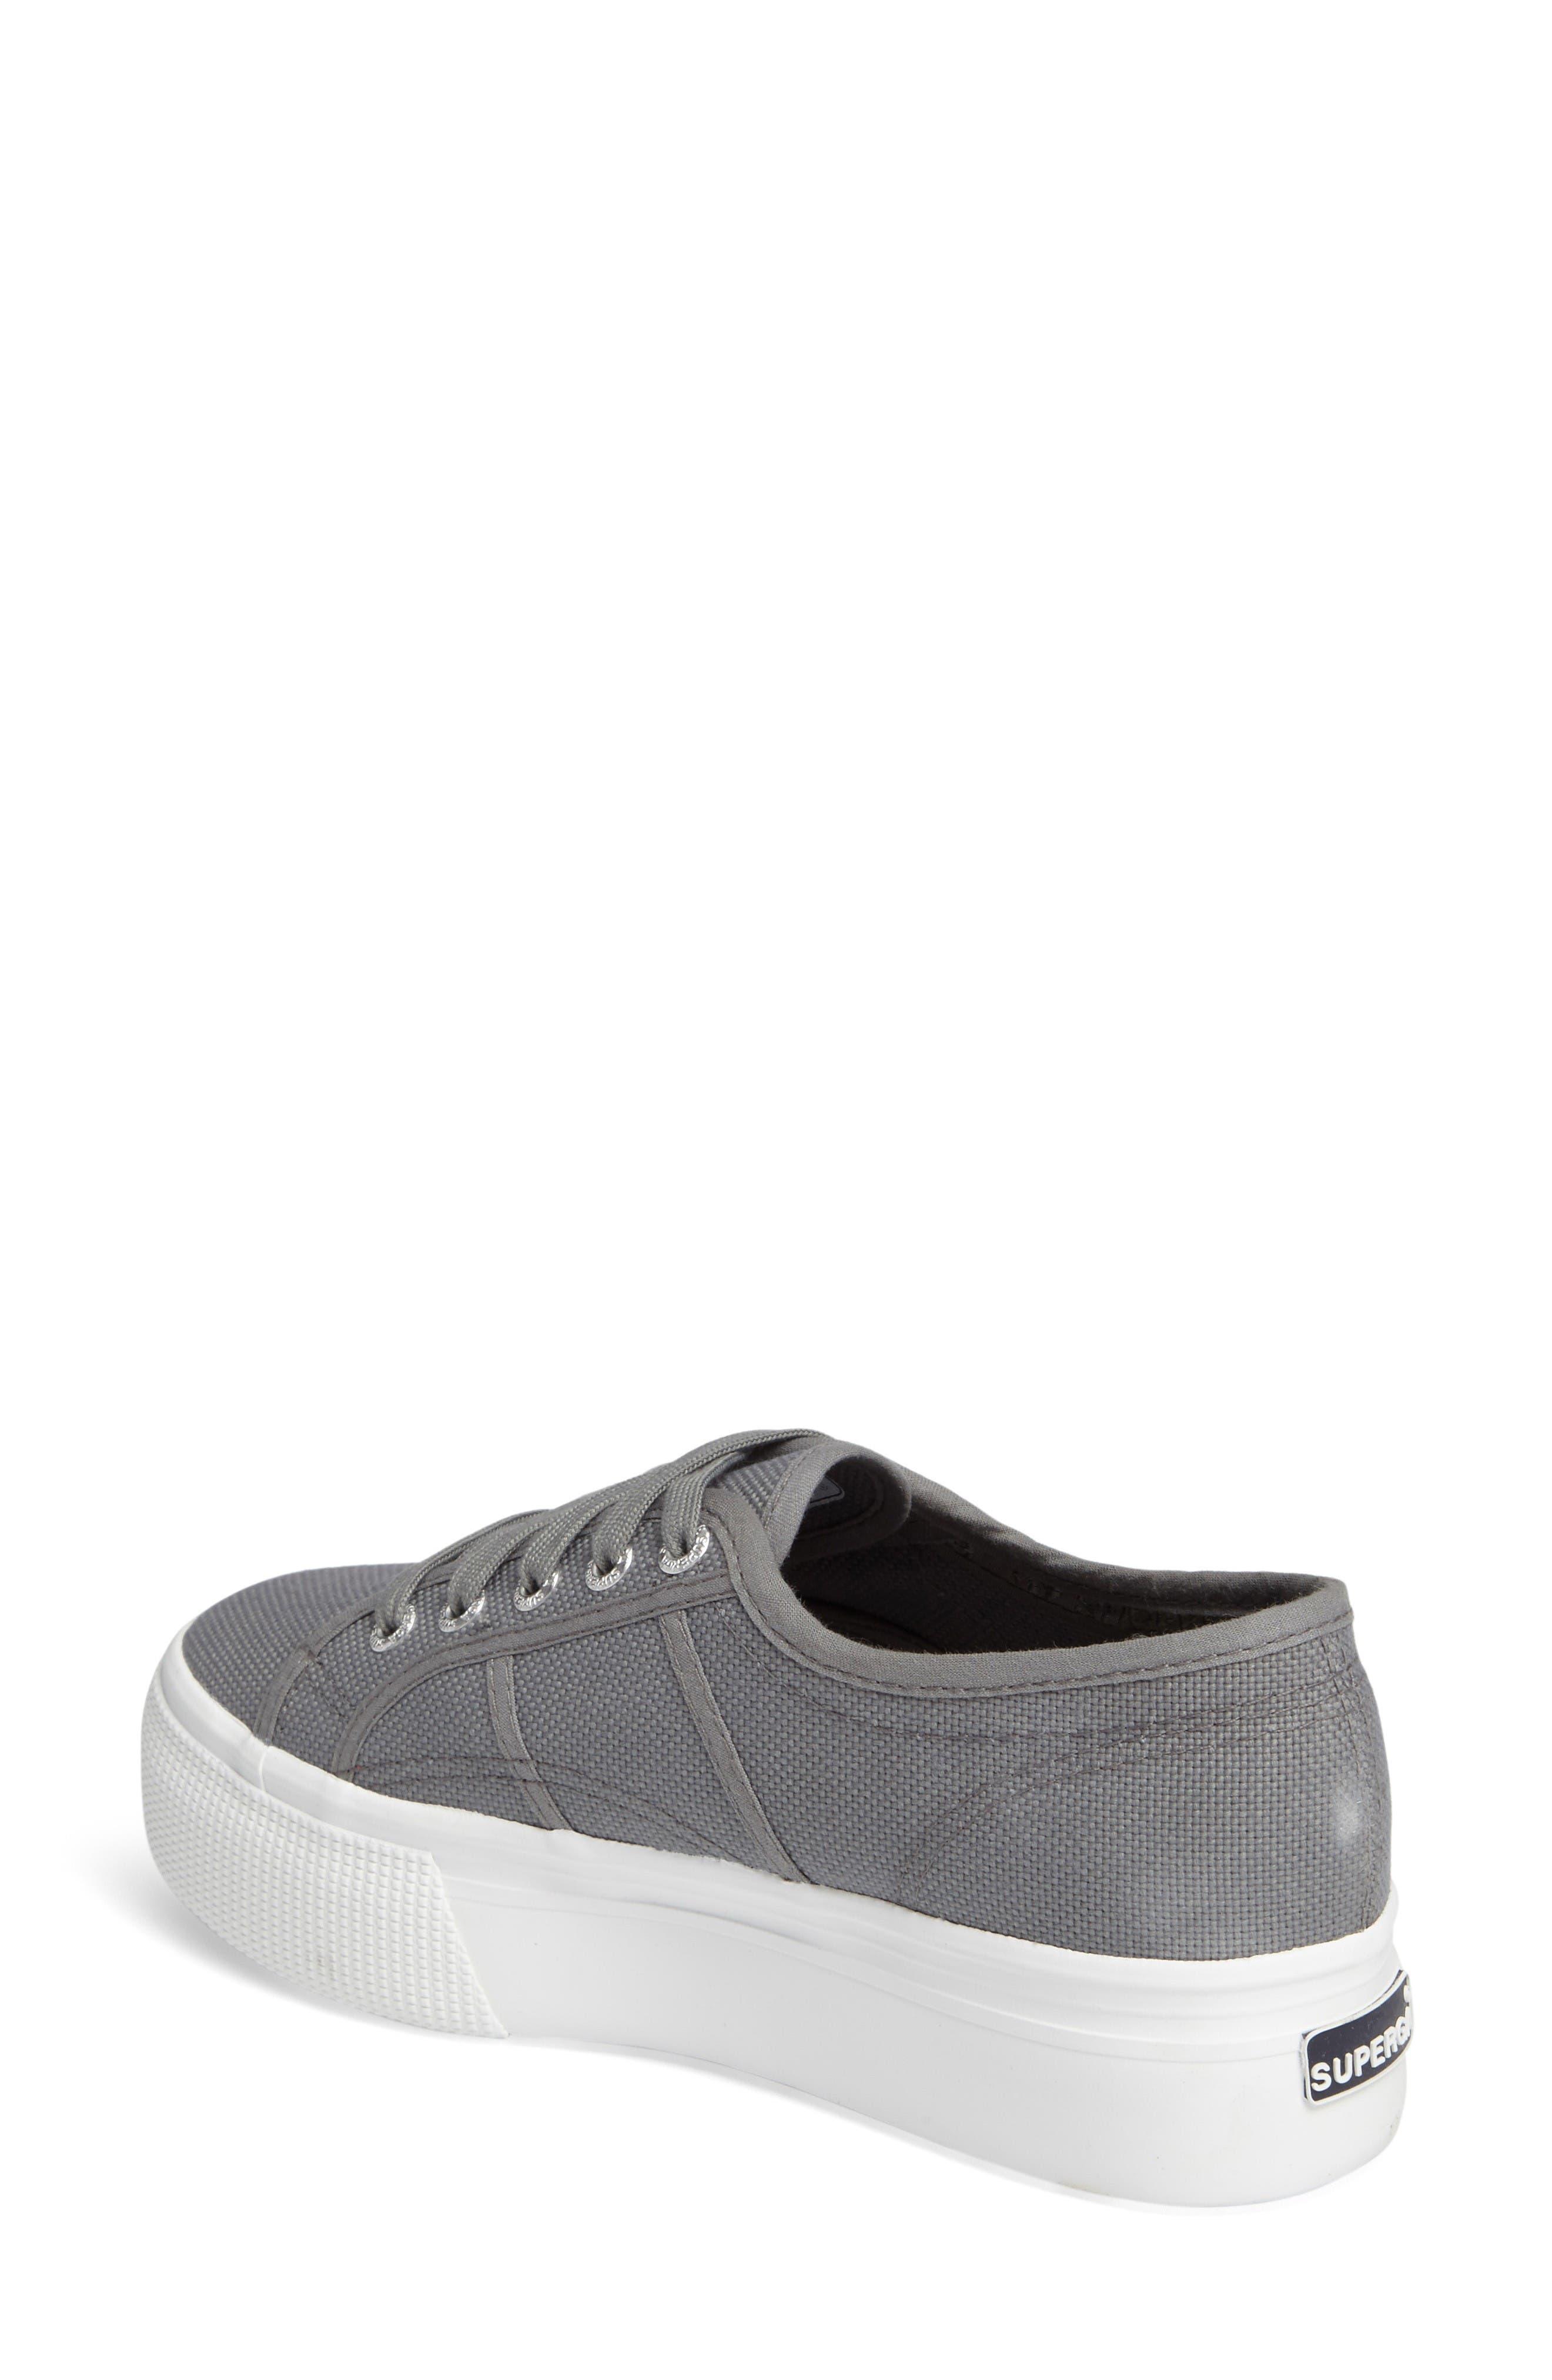 Alternate Image 2  - Superga 'Acot Linea' Sneaker (Women)